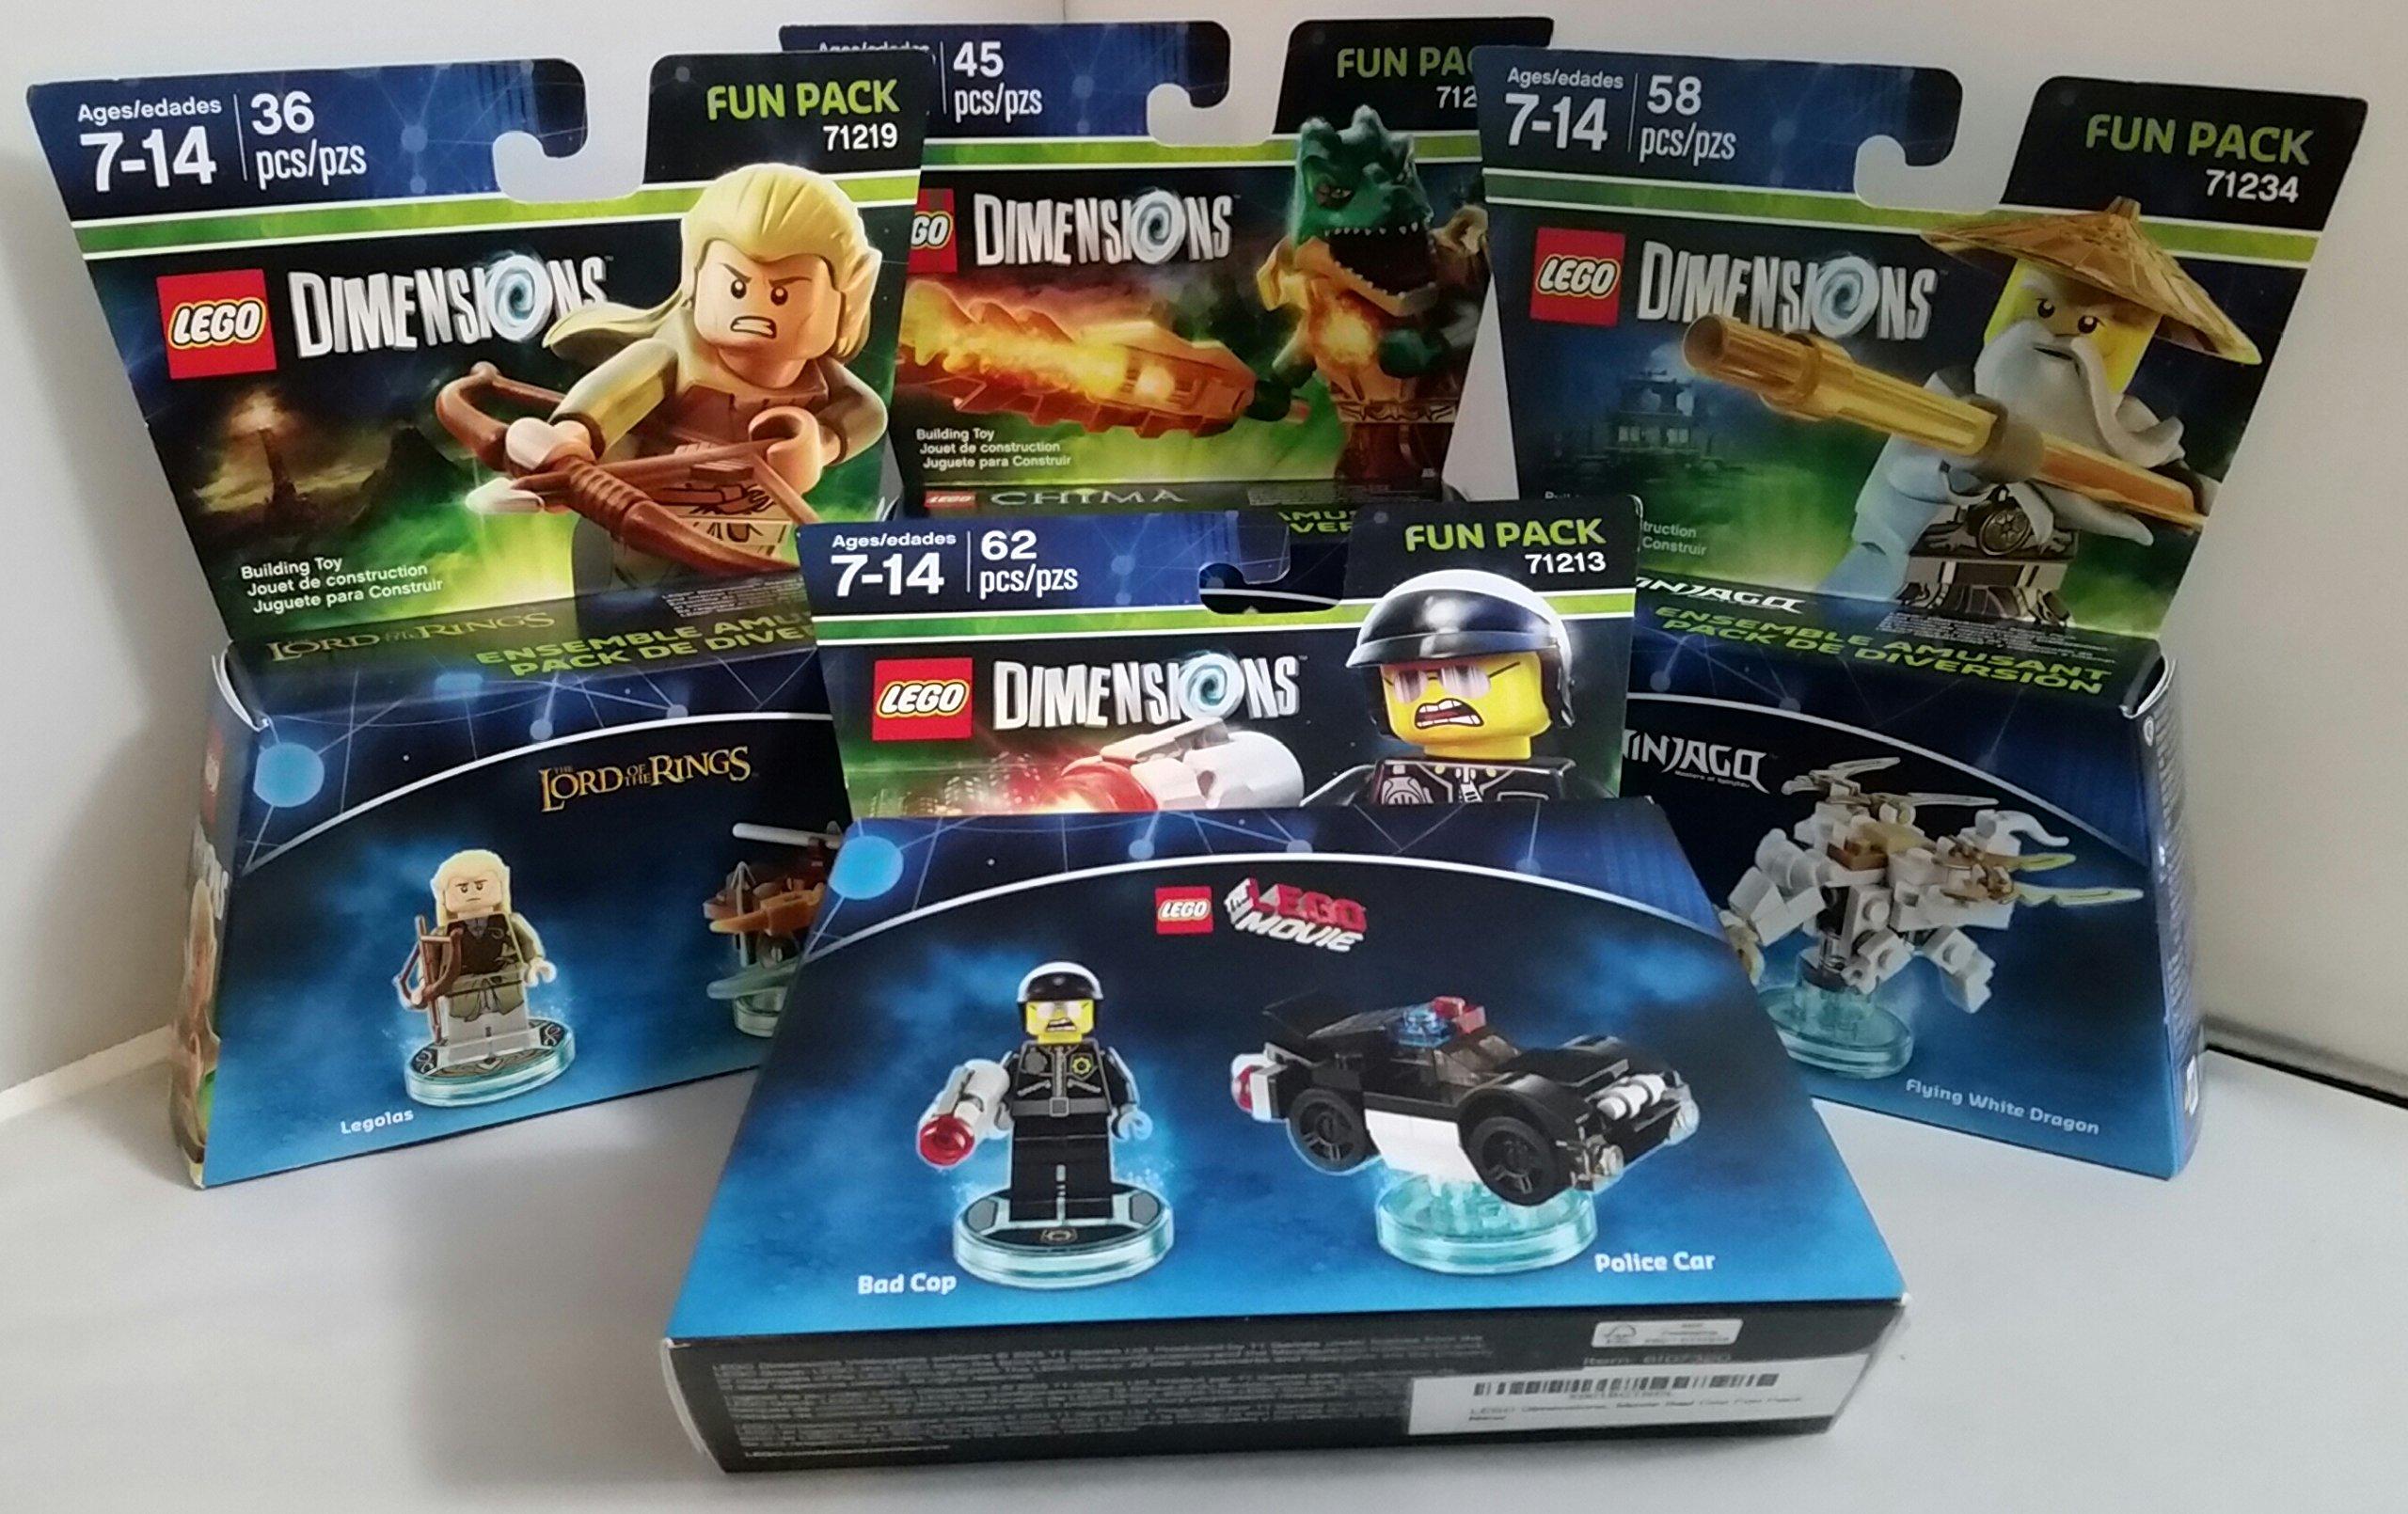 Amazon.com: Lego Dimensions Fun Pack Bundle 4 packs: Legolas ...